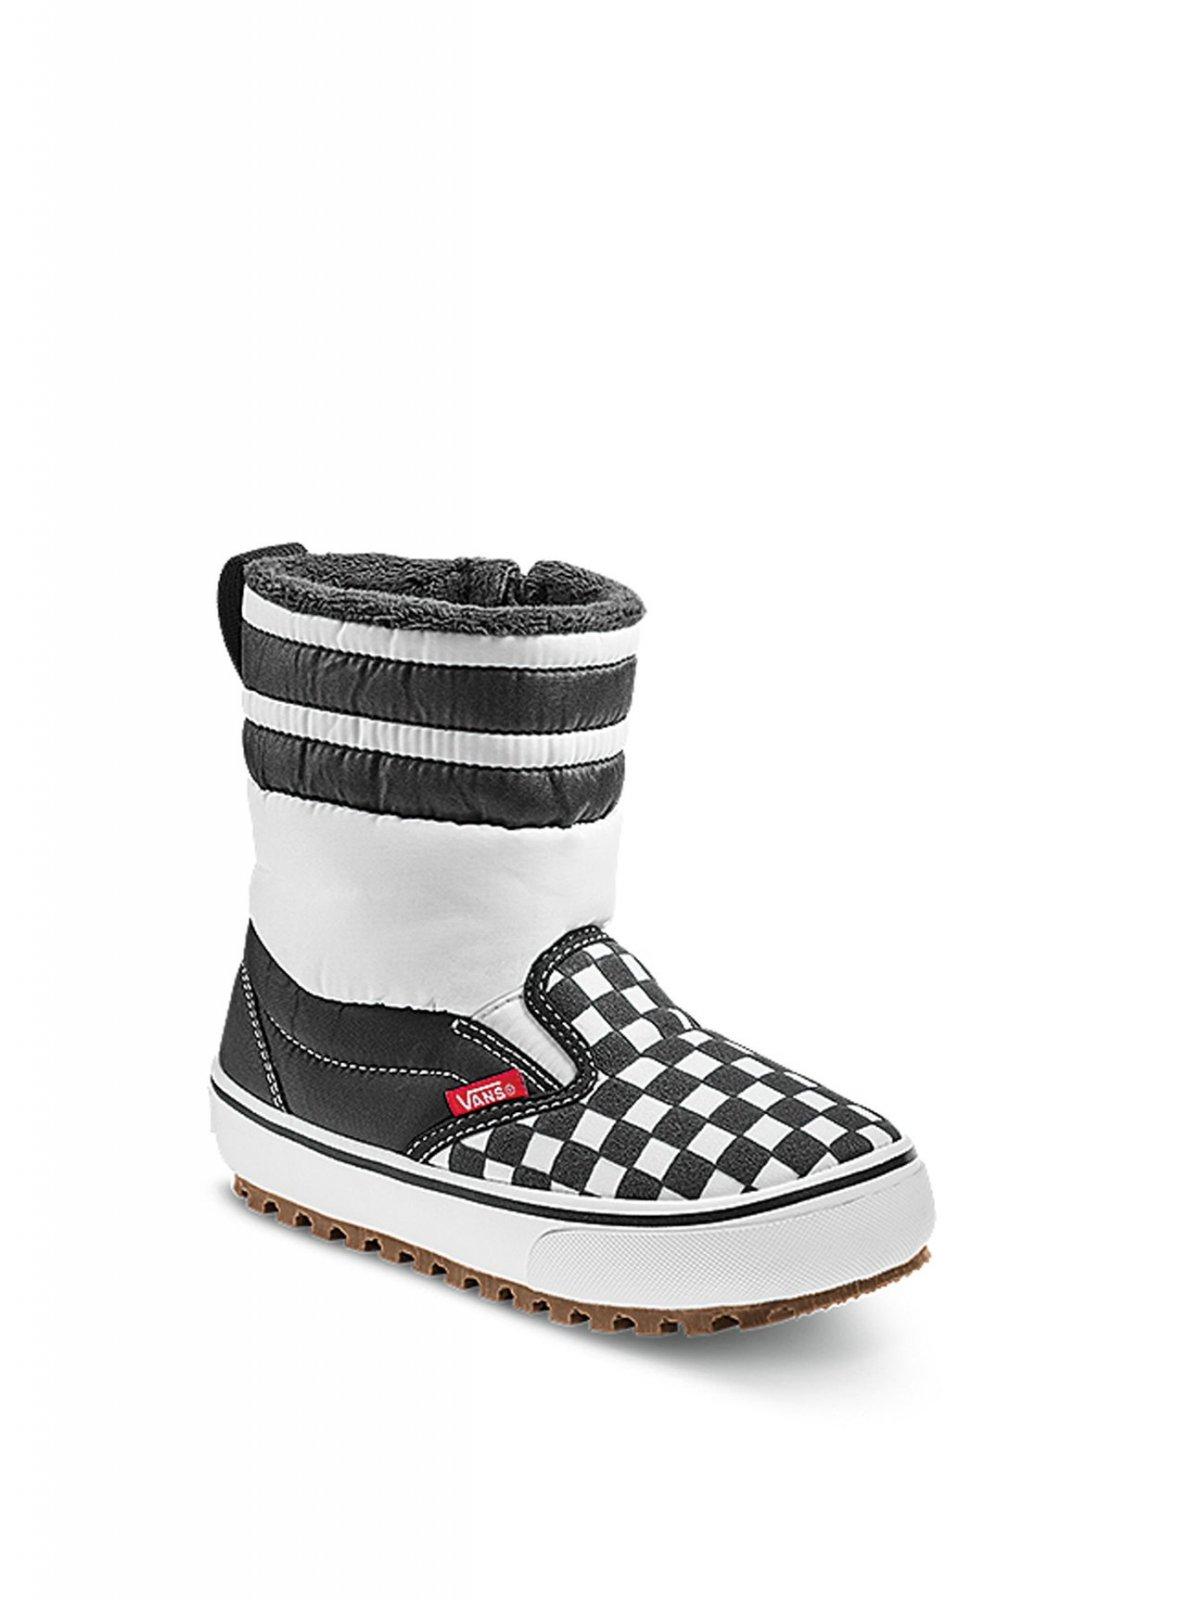 Vans Youth Slip-On Snow Boot MTE